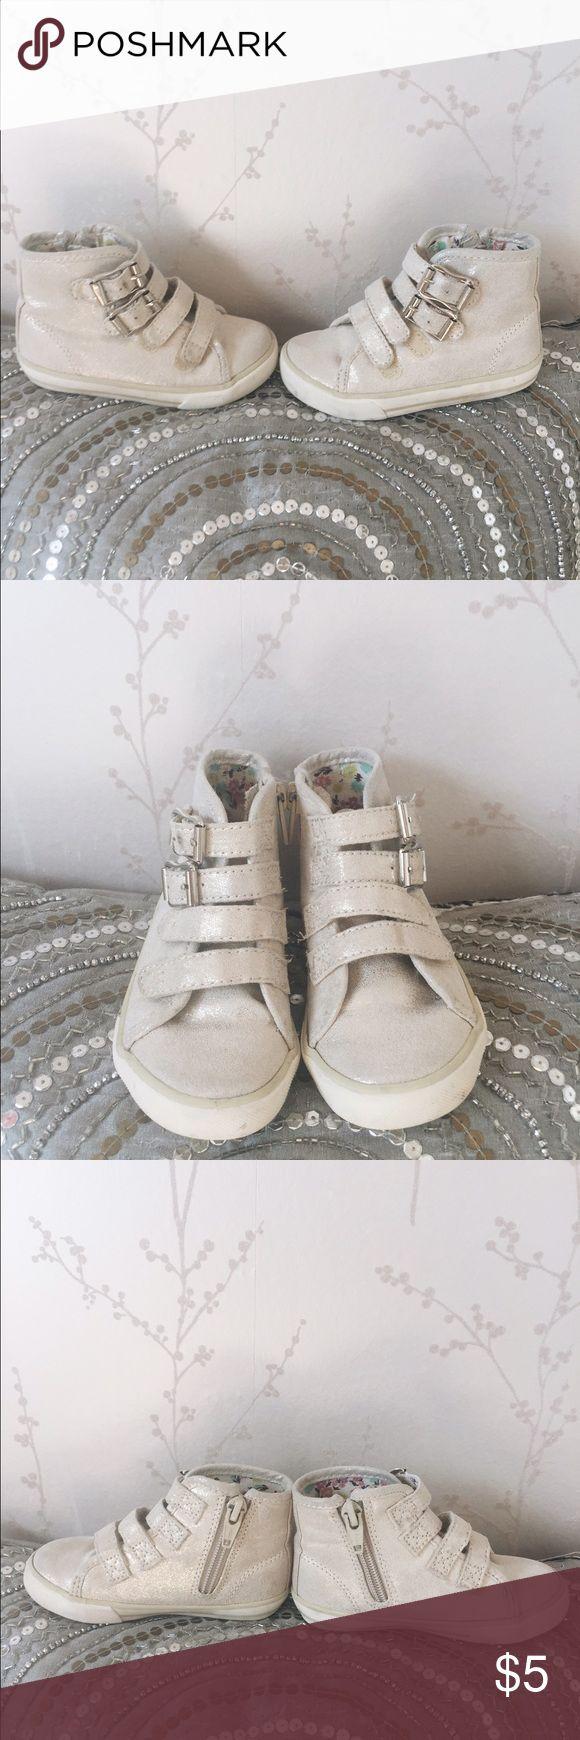 Girls Moto cream shimmer high tops! Girls Moto cream shimmer high tops! In good condition! Cherokee brand size 6! 🎀 Cherokee Shoes Sneakers